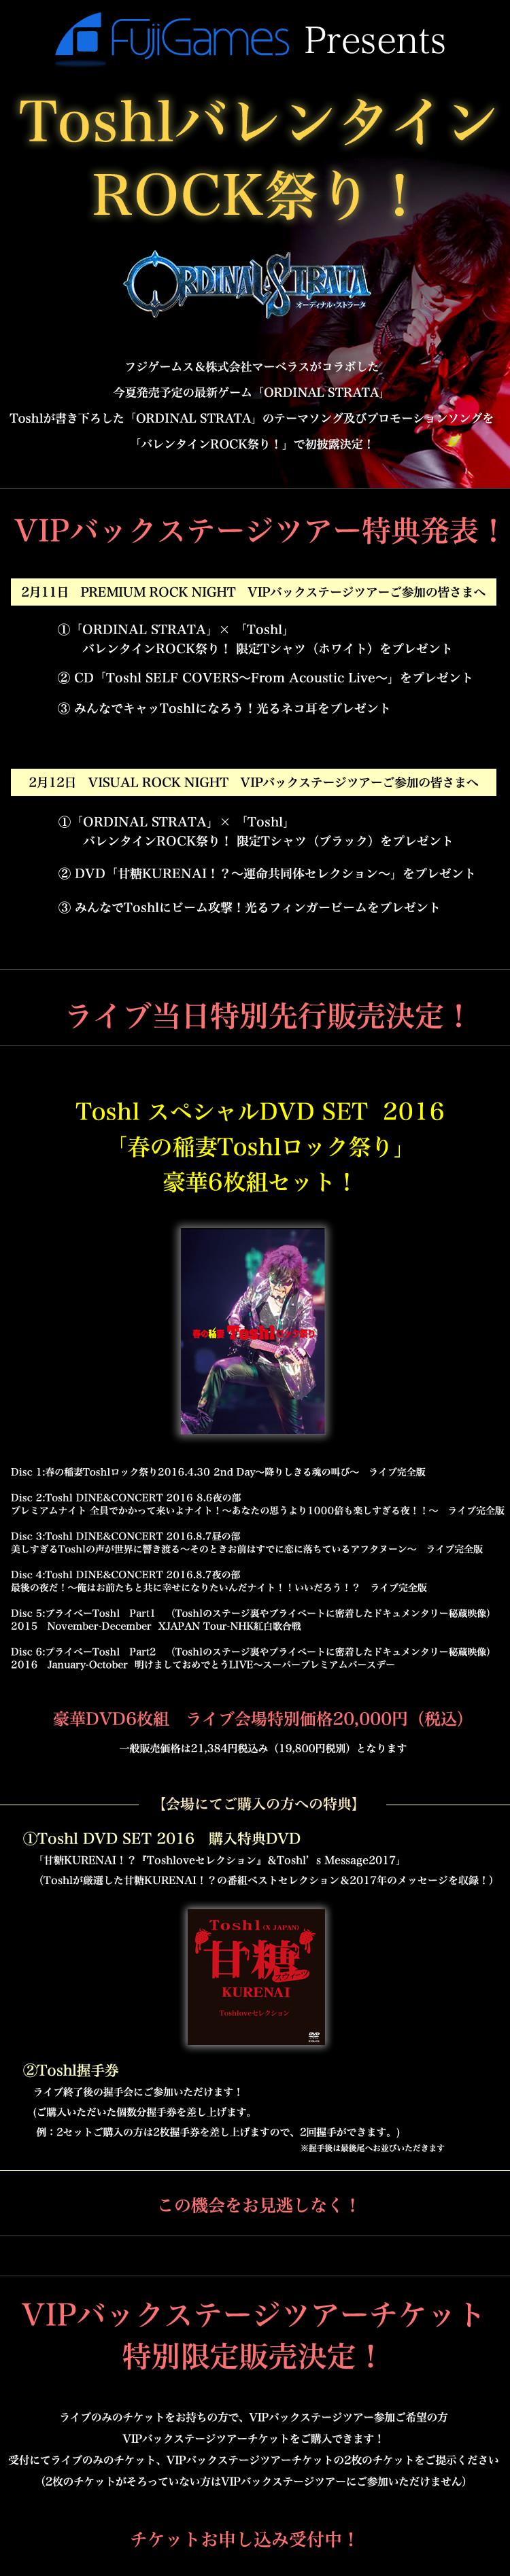 Toshl バレンタインROCK祭り!